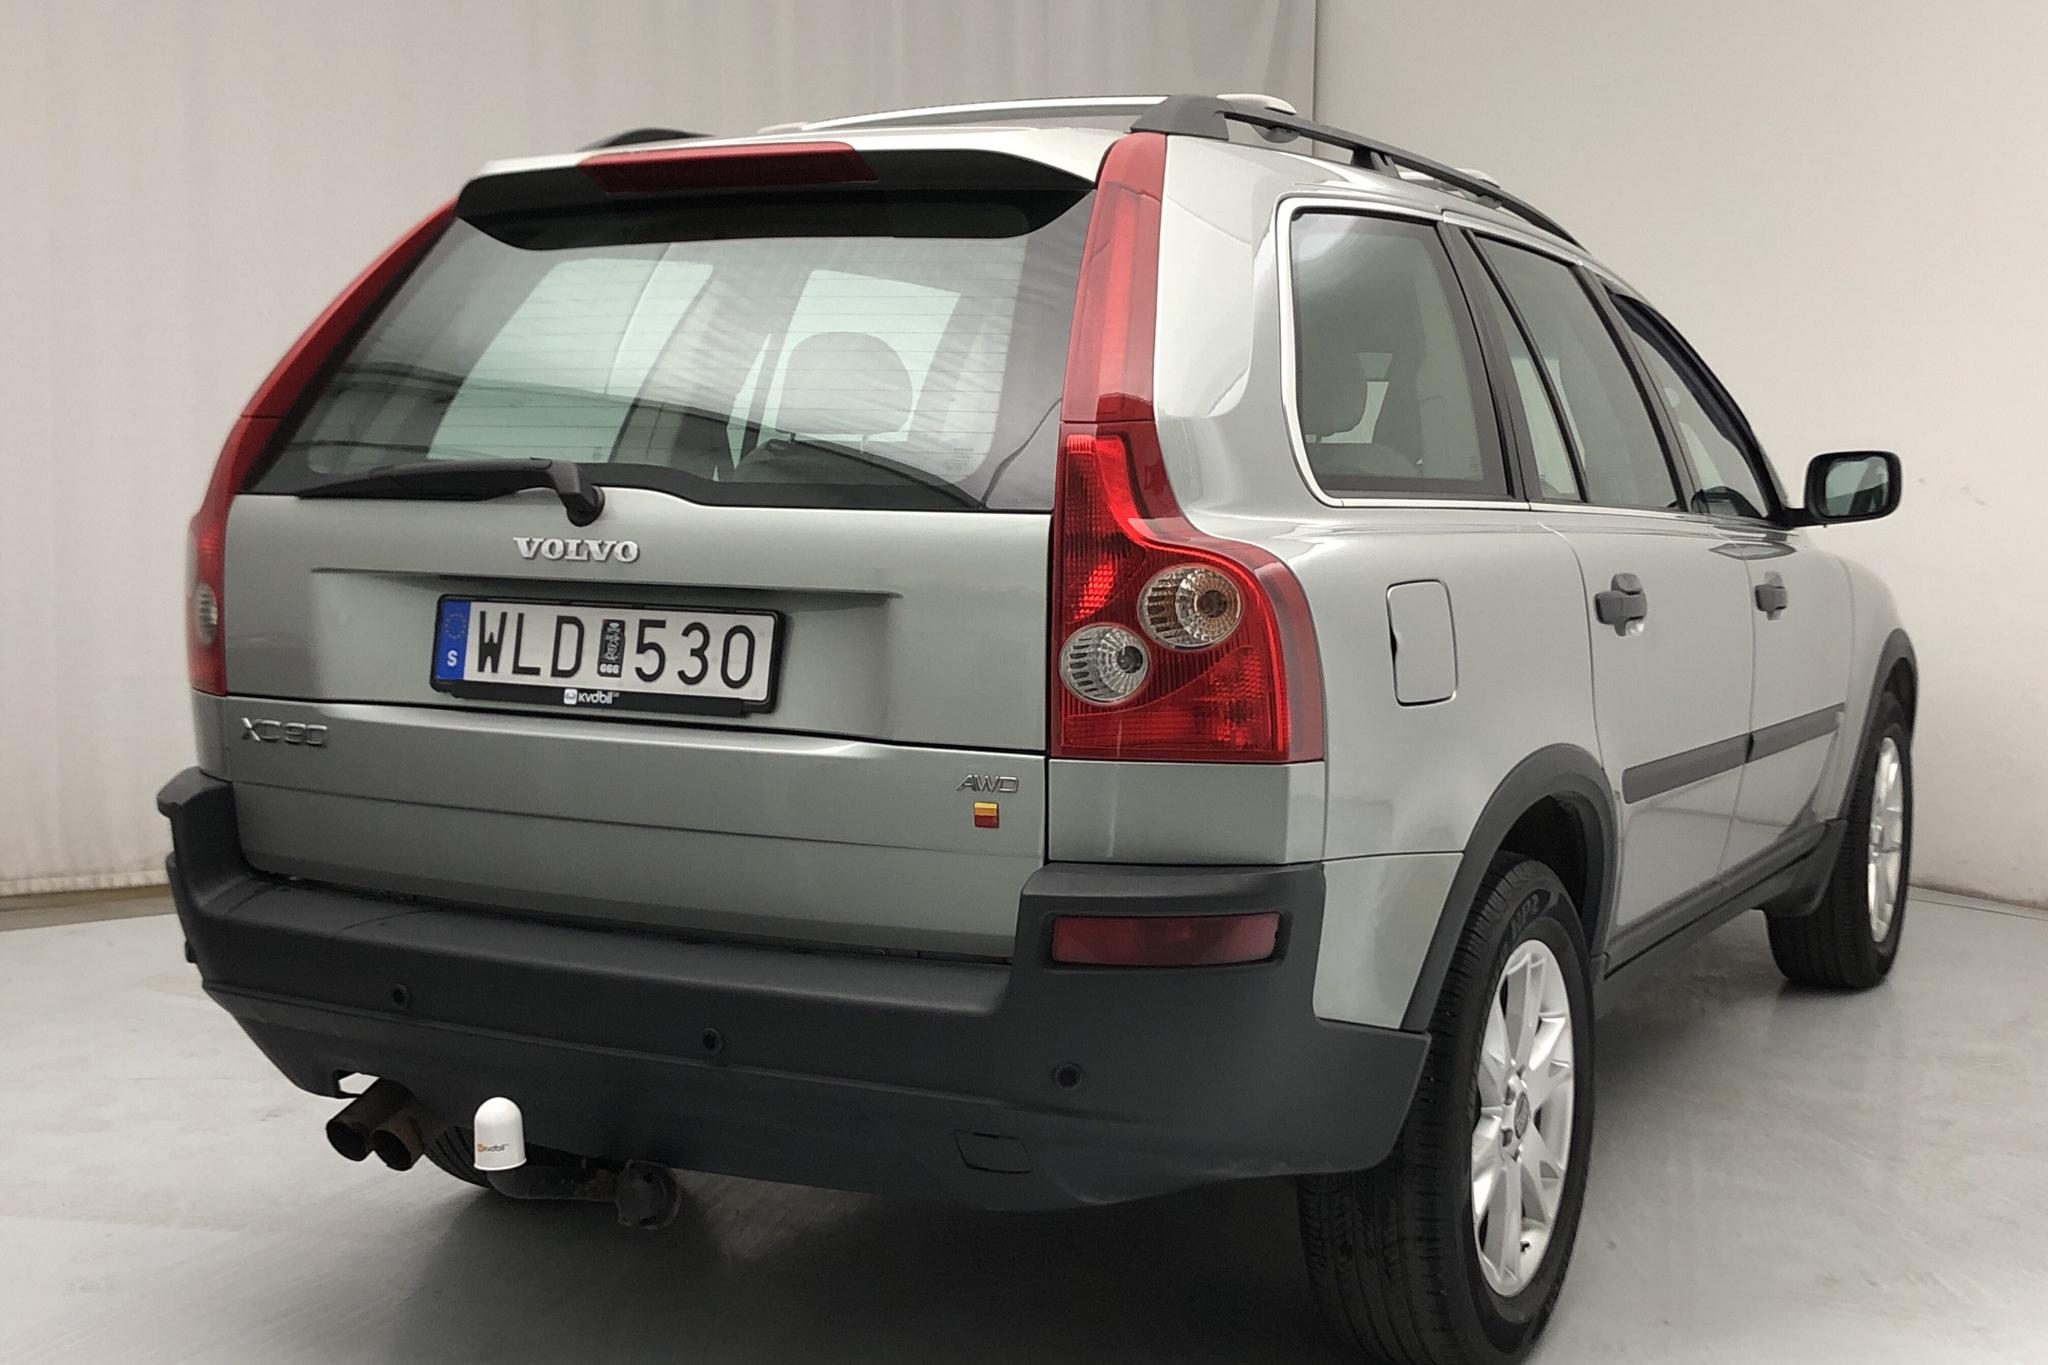 Volvo XC90 2.5T (210hk) - 203 020 km - Automatic - green - 2005